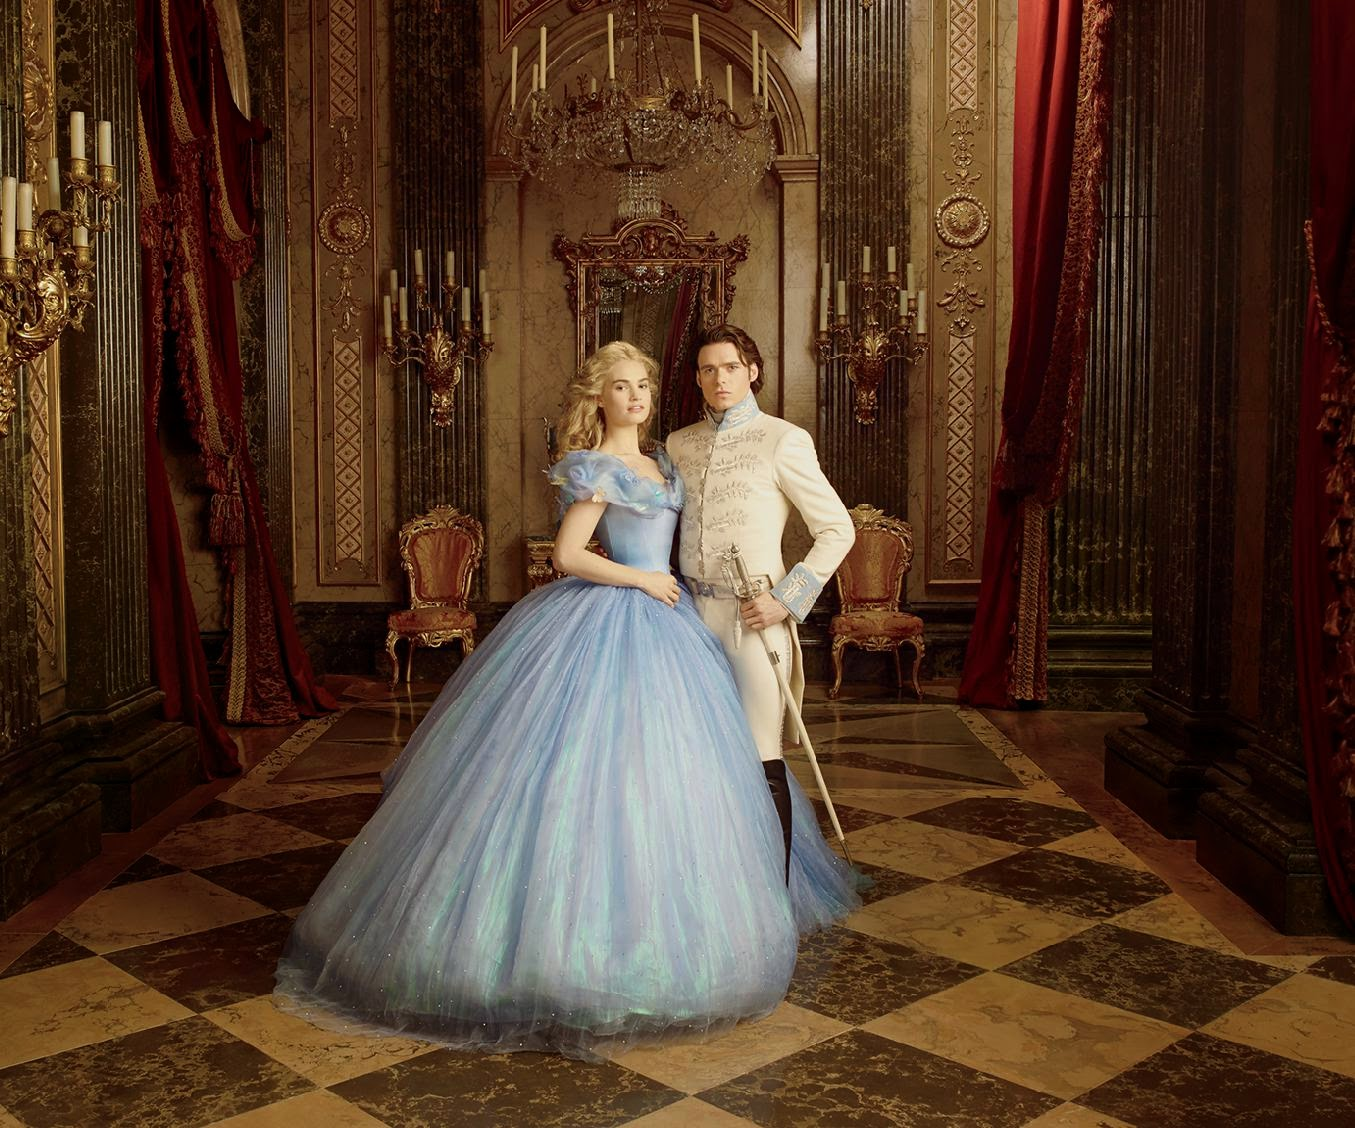 Cinderella 2015 Movie Cinderella dan Pangeran Tampan